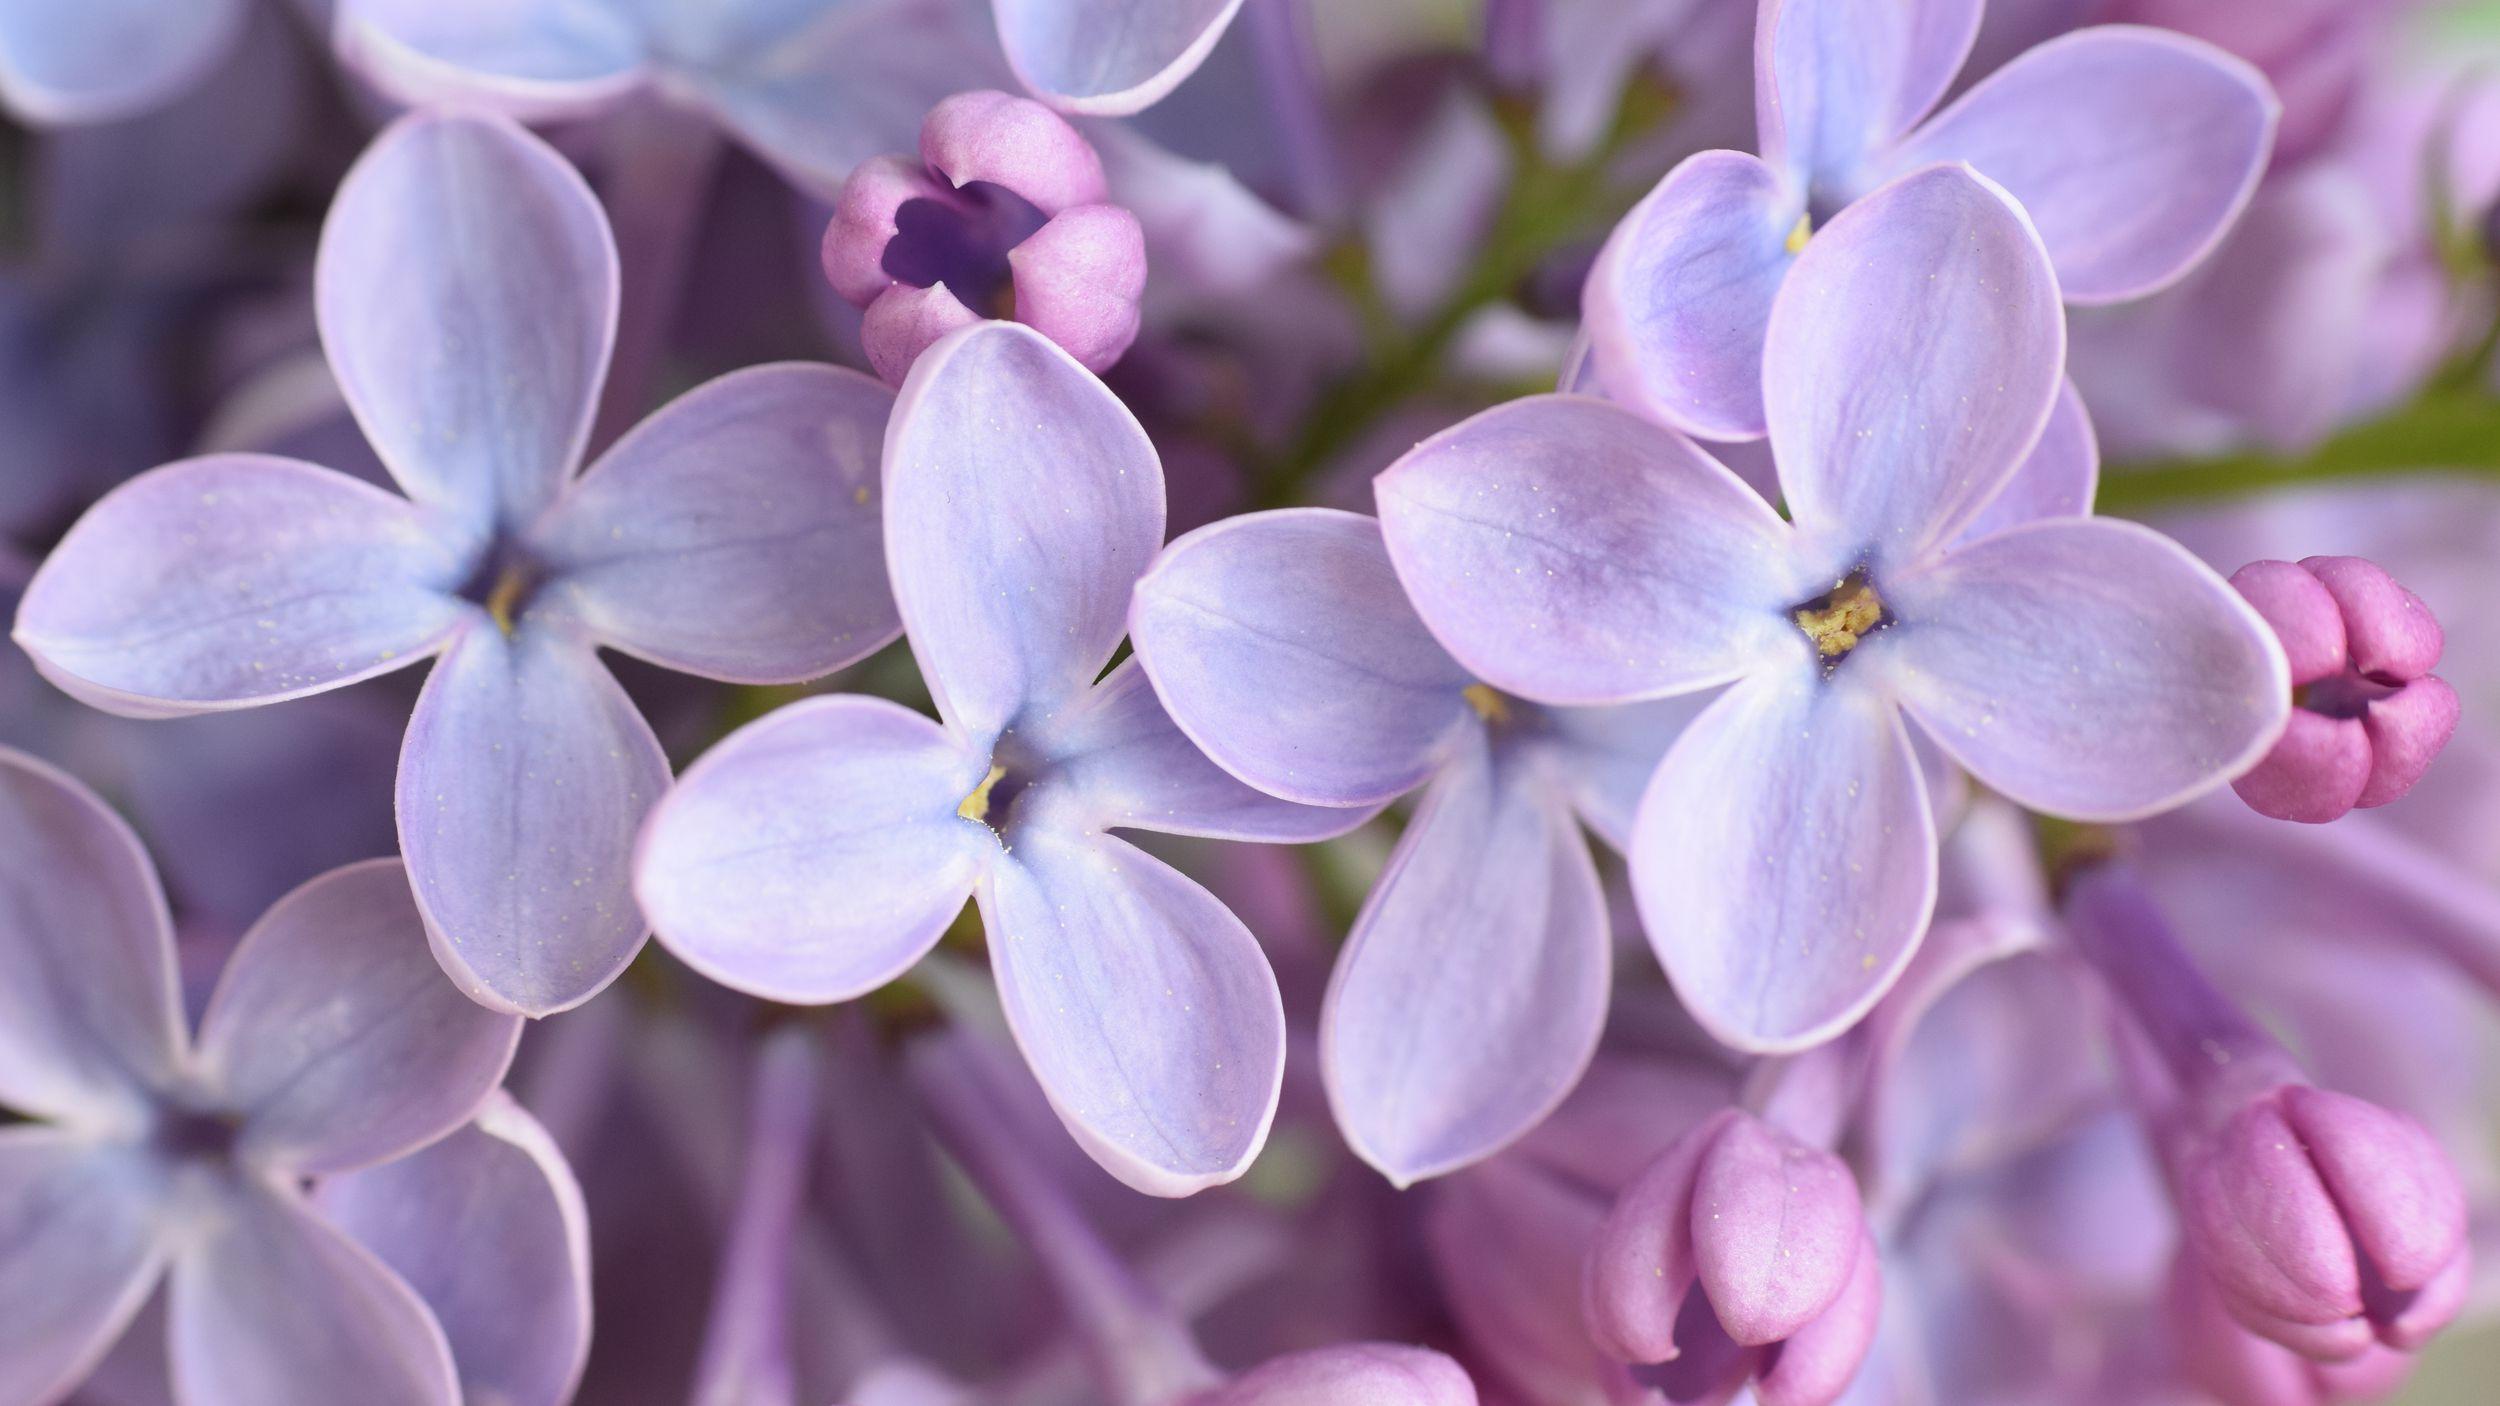 17f7204c4333bc265bb7f1e1d47a2f7f--plant-catalogs-seed-pods.jpg